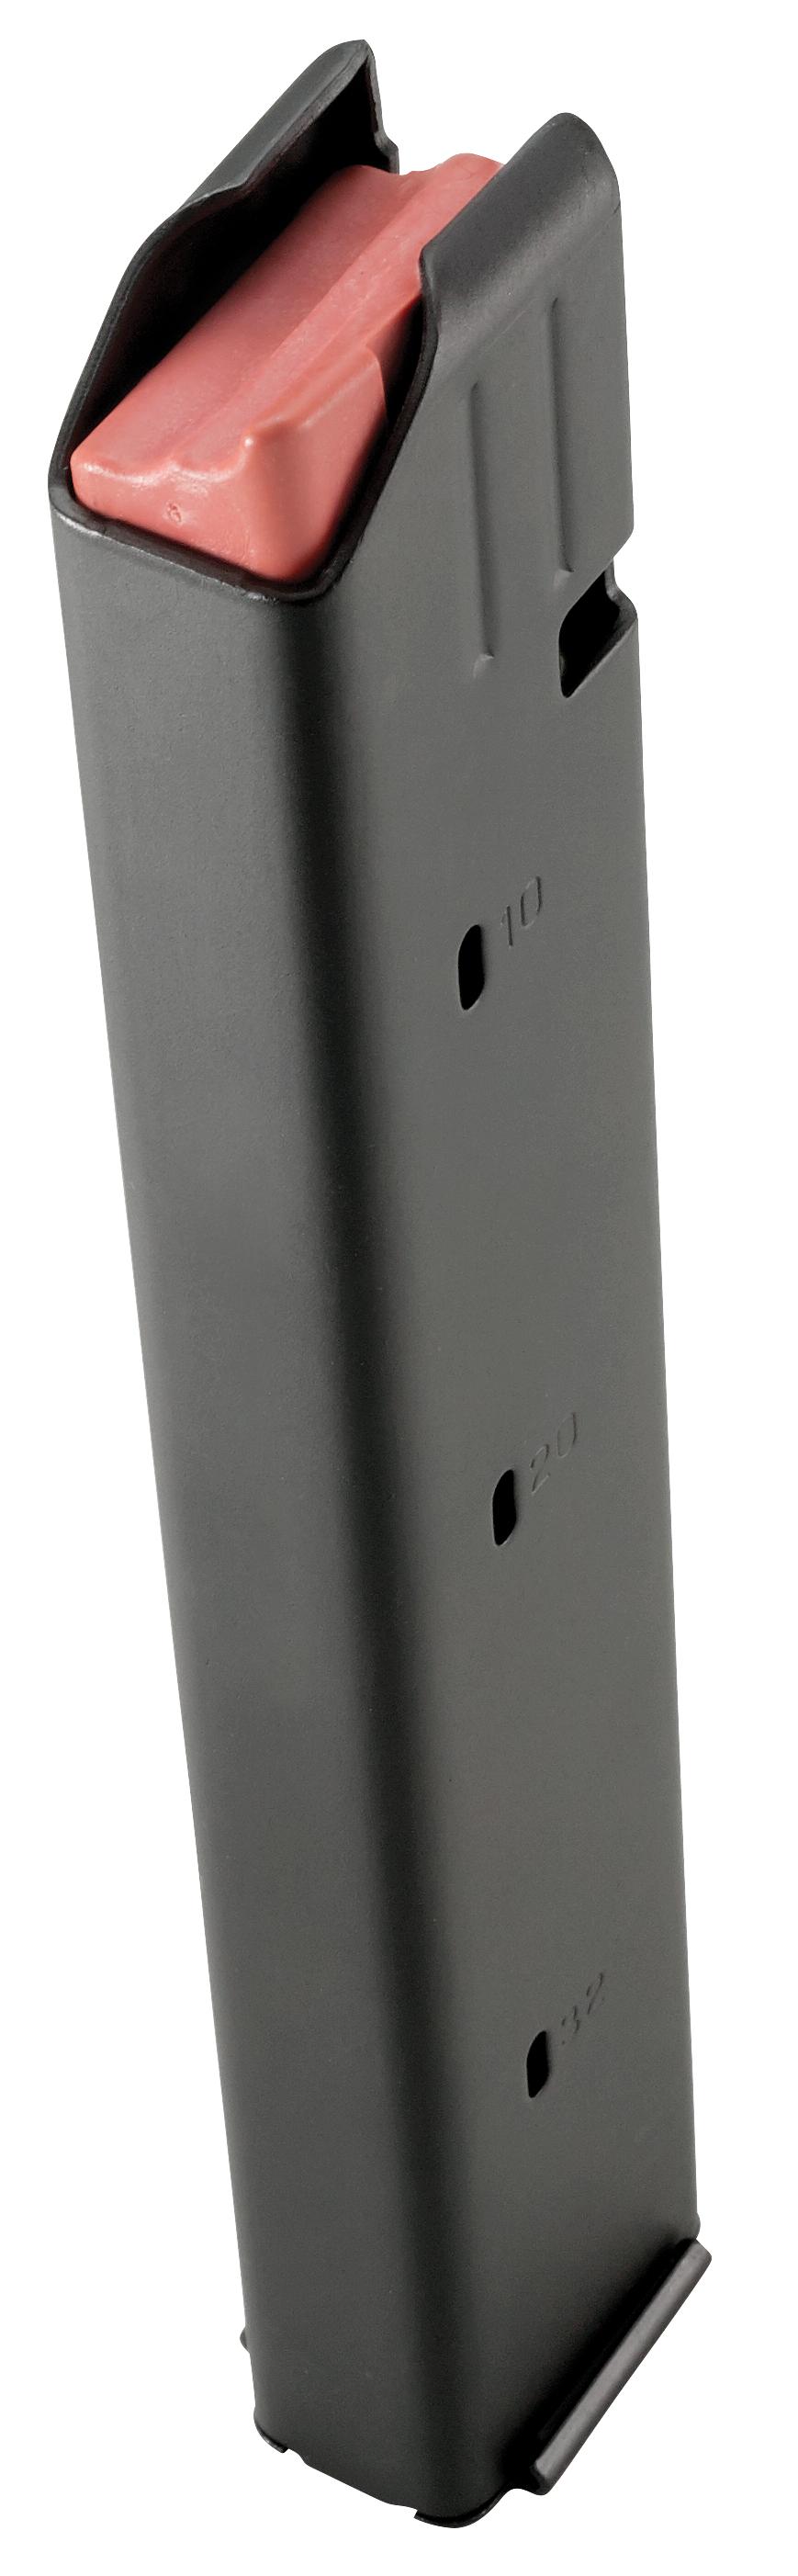 C PRODUCTS DEFENSE AR-15